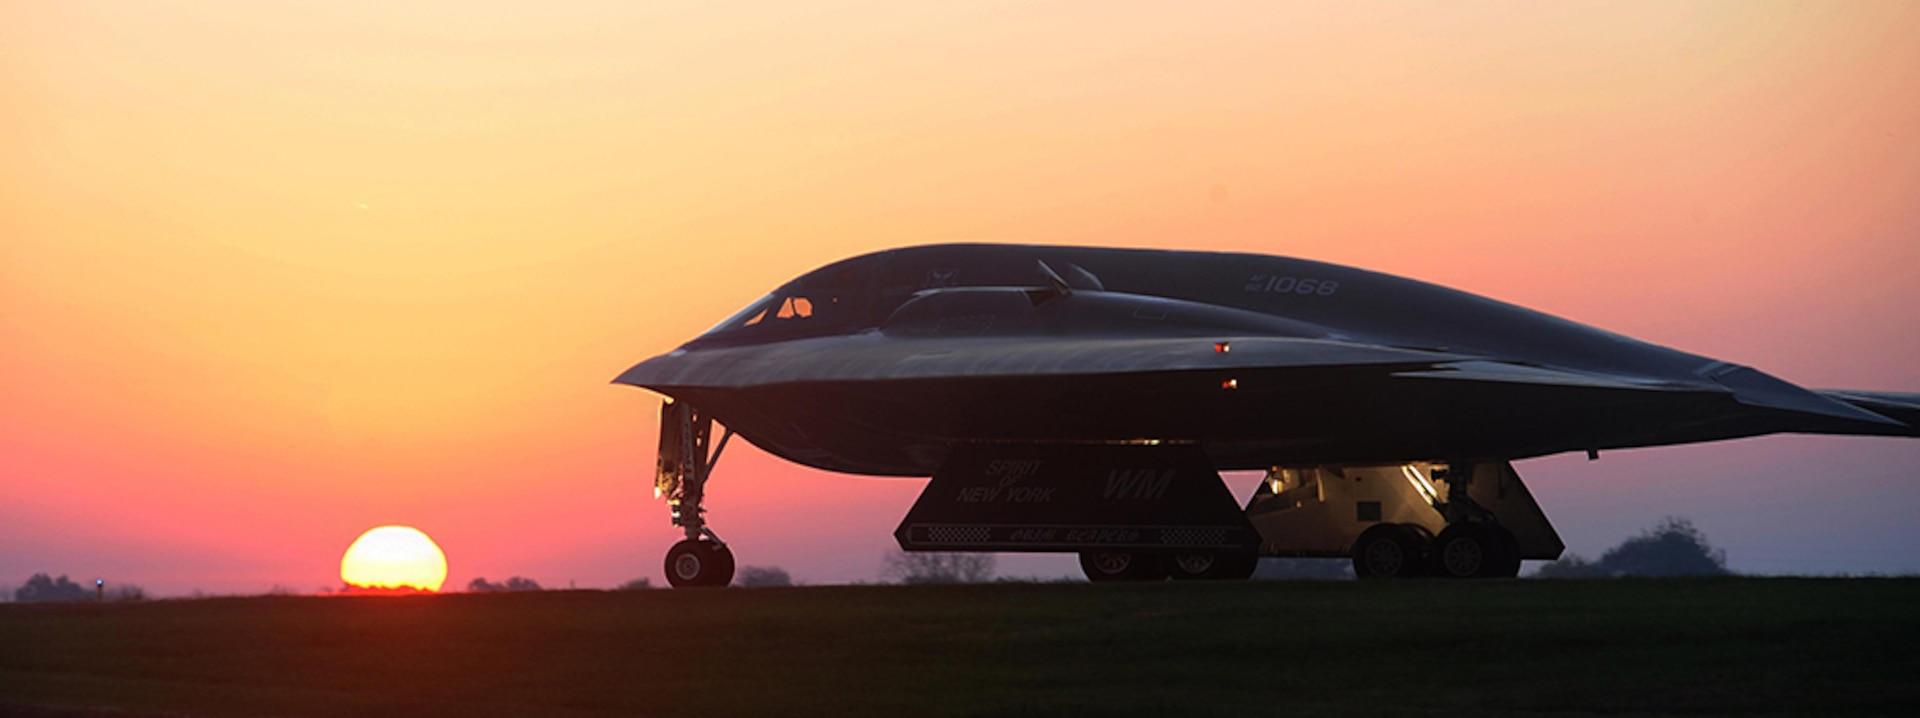 File photo of U.S. Air Force B-2 Spirit bomber aircraft.